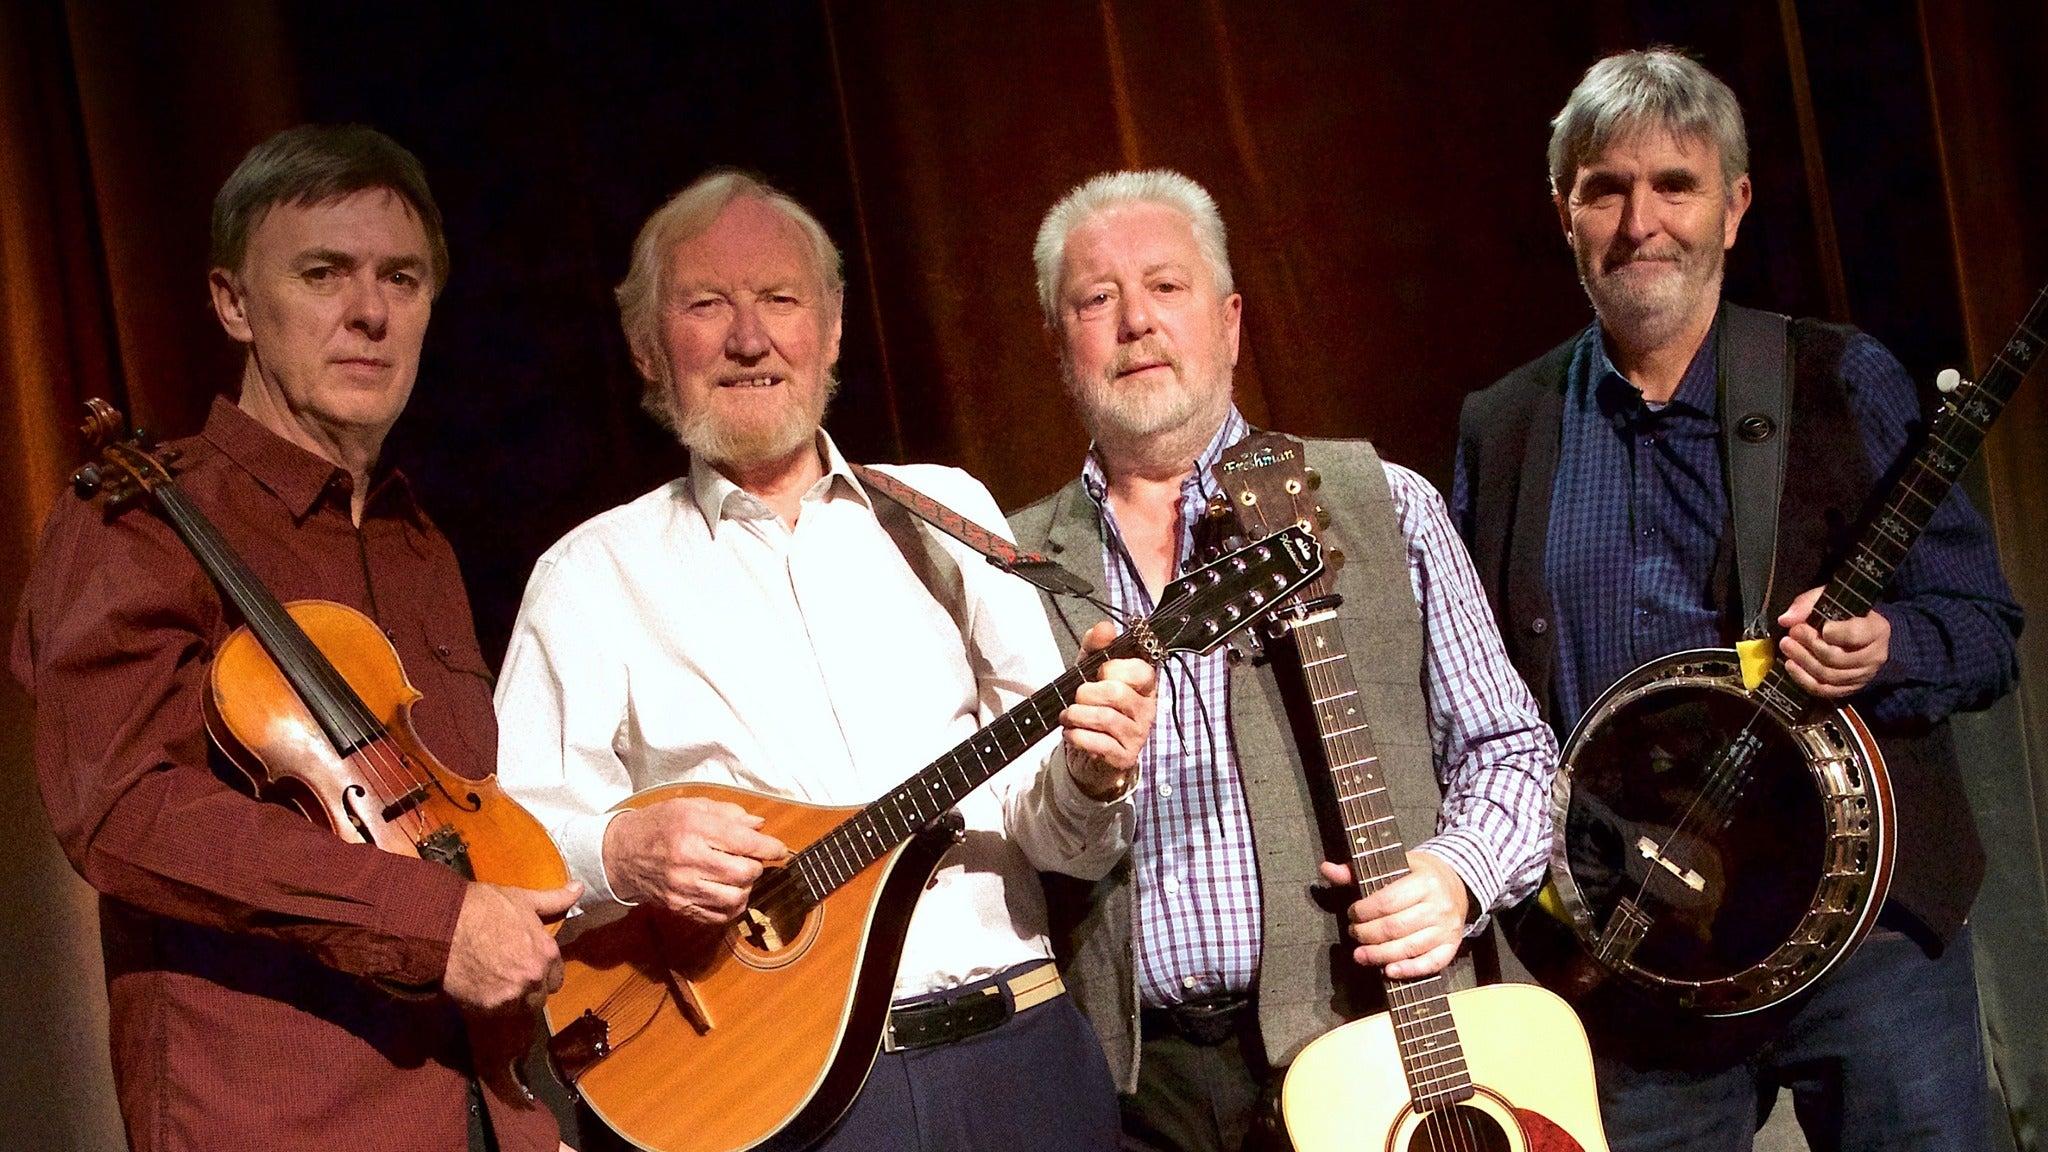 The Dublin Legends (The Dubliners)